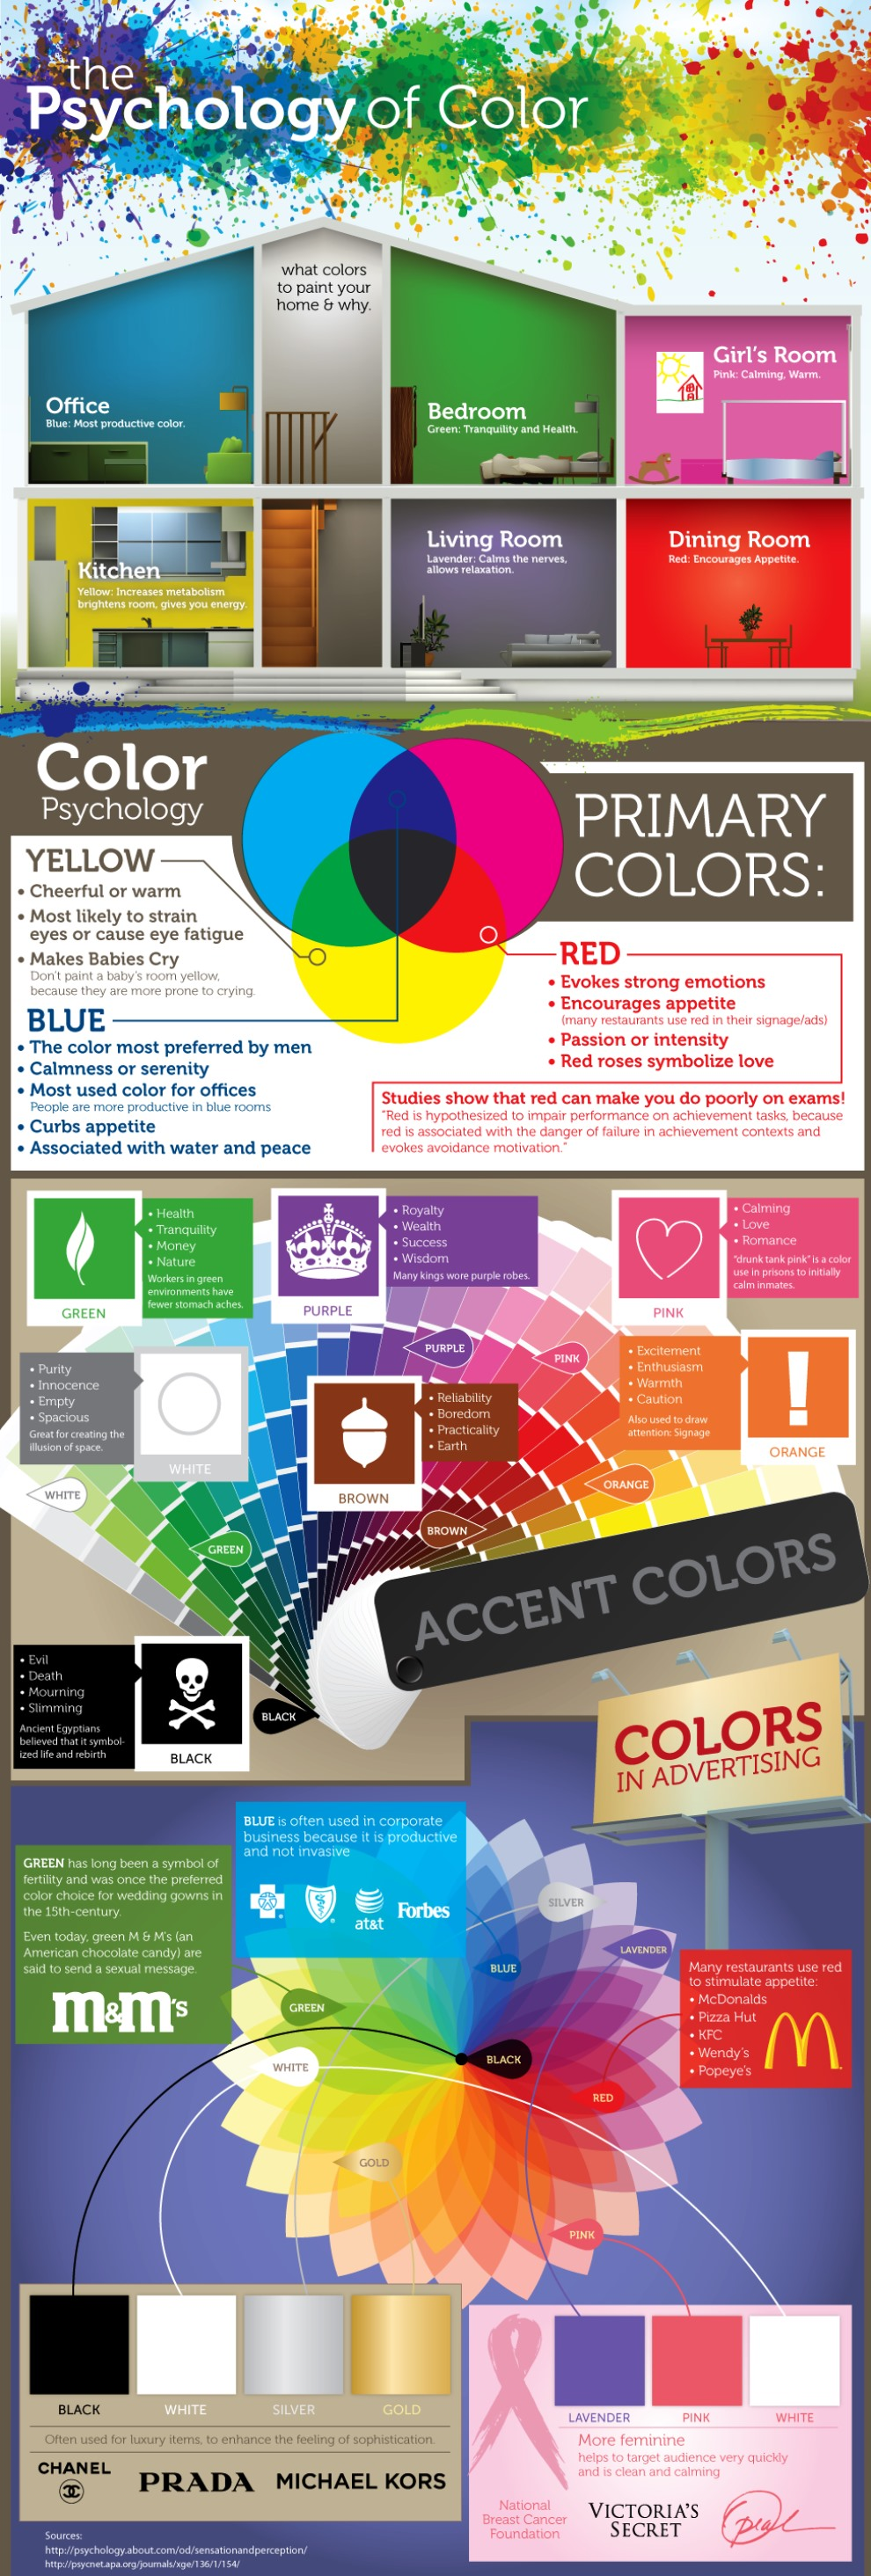 fascinating-psychology-of-color